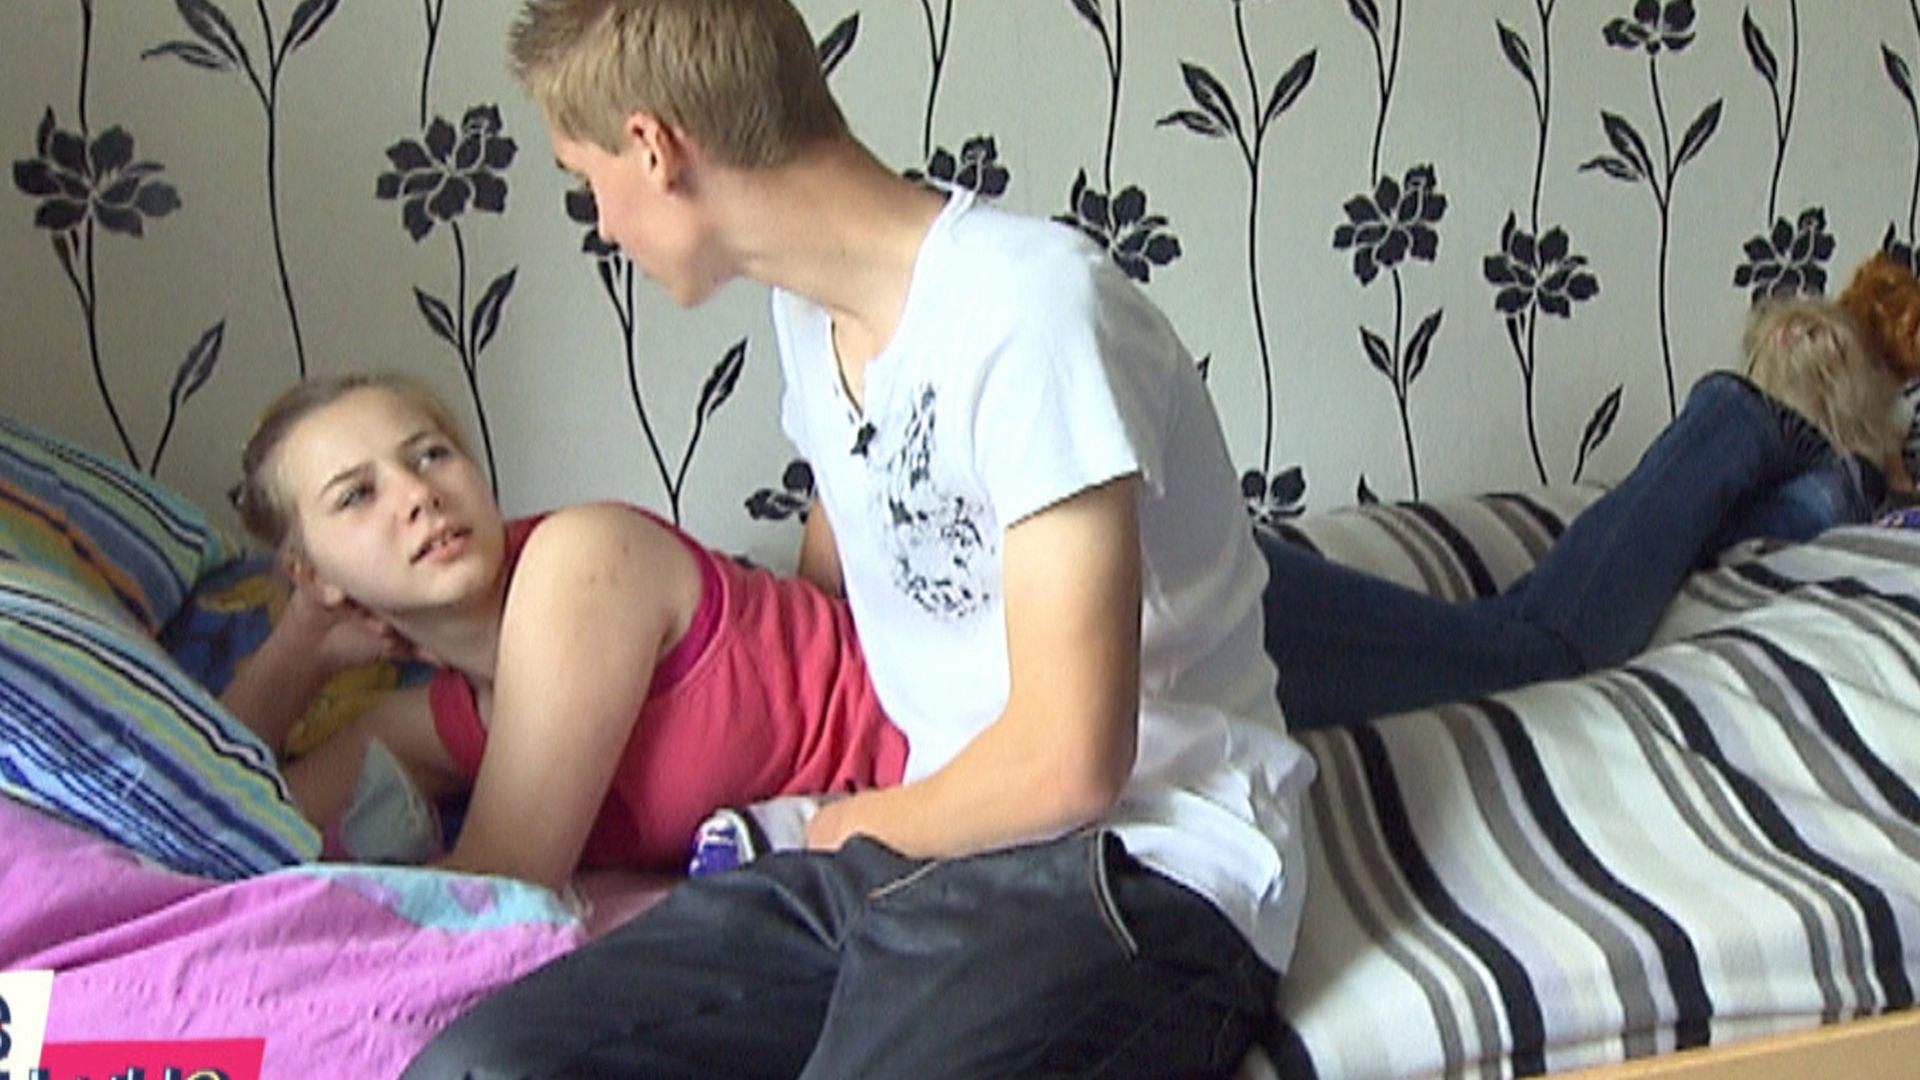 Sarafina Wollny: Eltern-Trennung ist kein PR-Gag